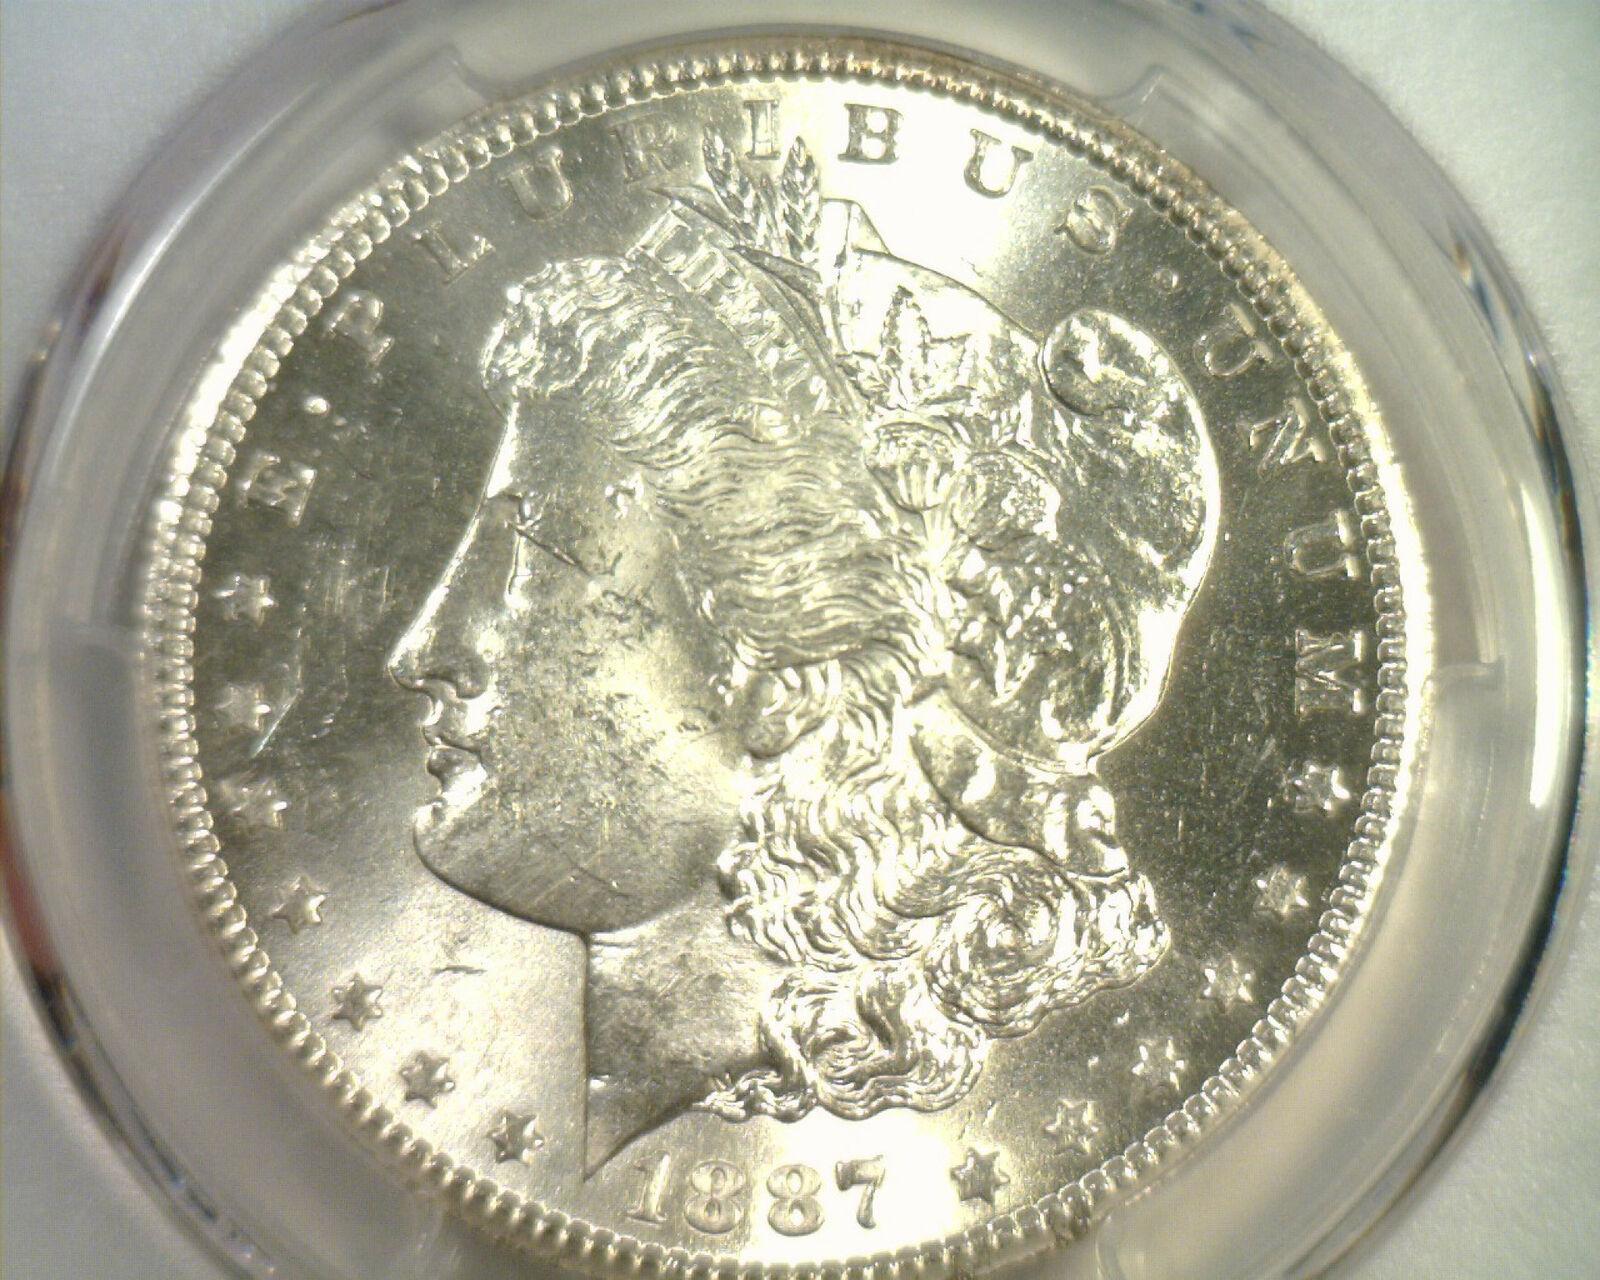 1887-S MORGAN SILVER DOLLAR PCGS MS63 NICE ORIGINAL COIN PREMIUM QUALITY PQ image 3